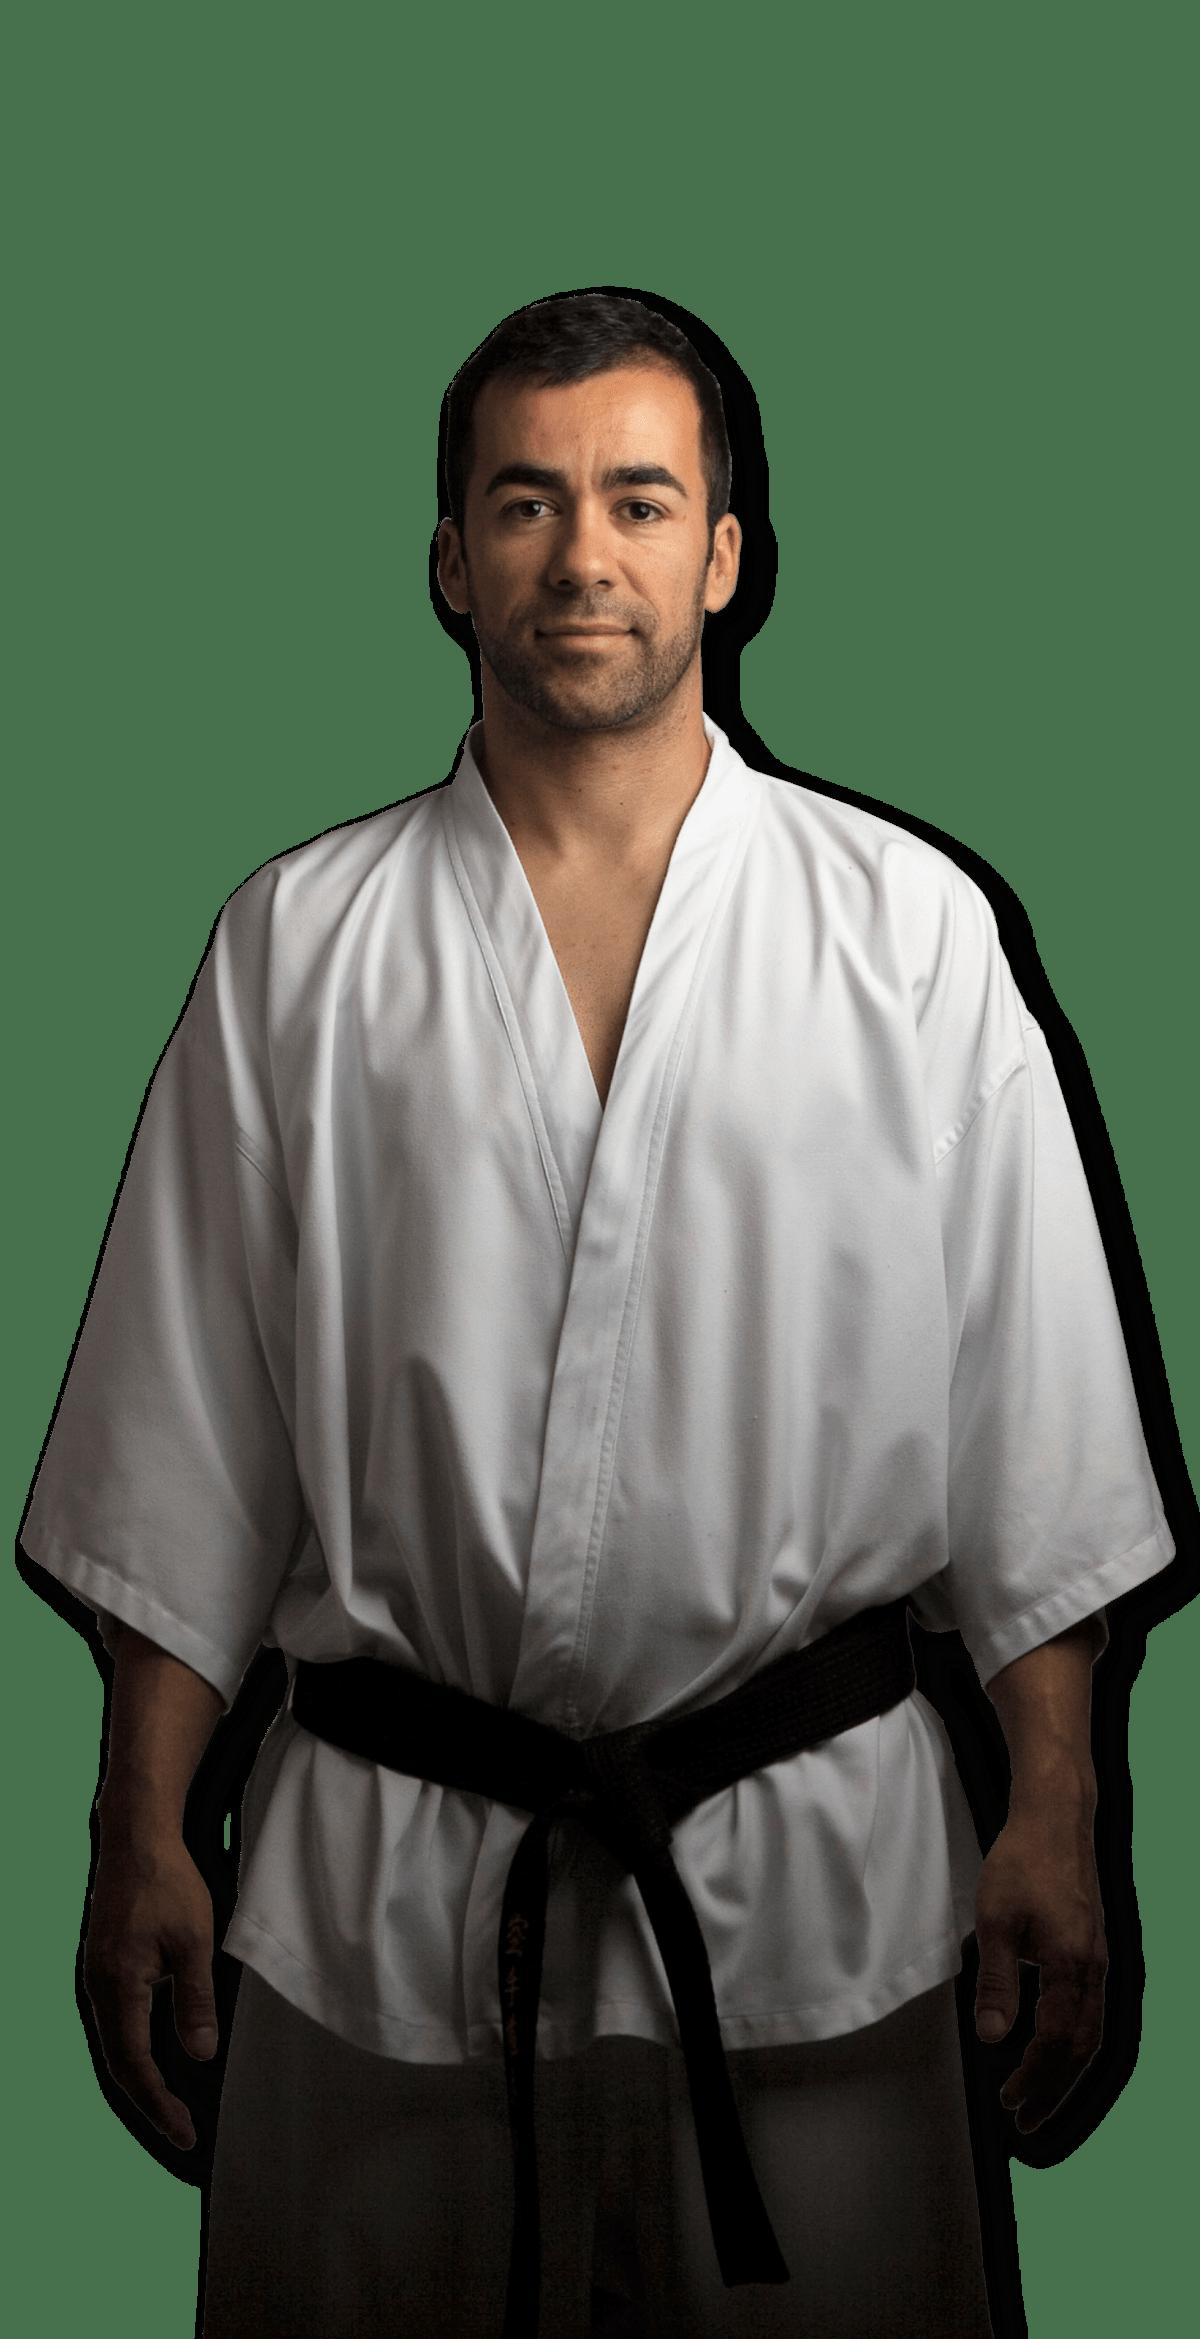 profesor de karate en dojo kaisho